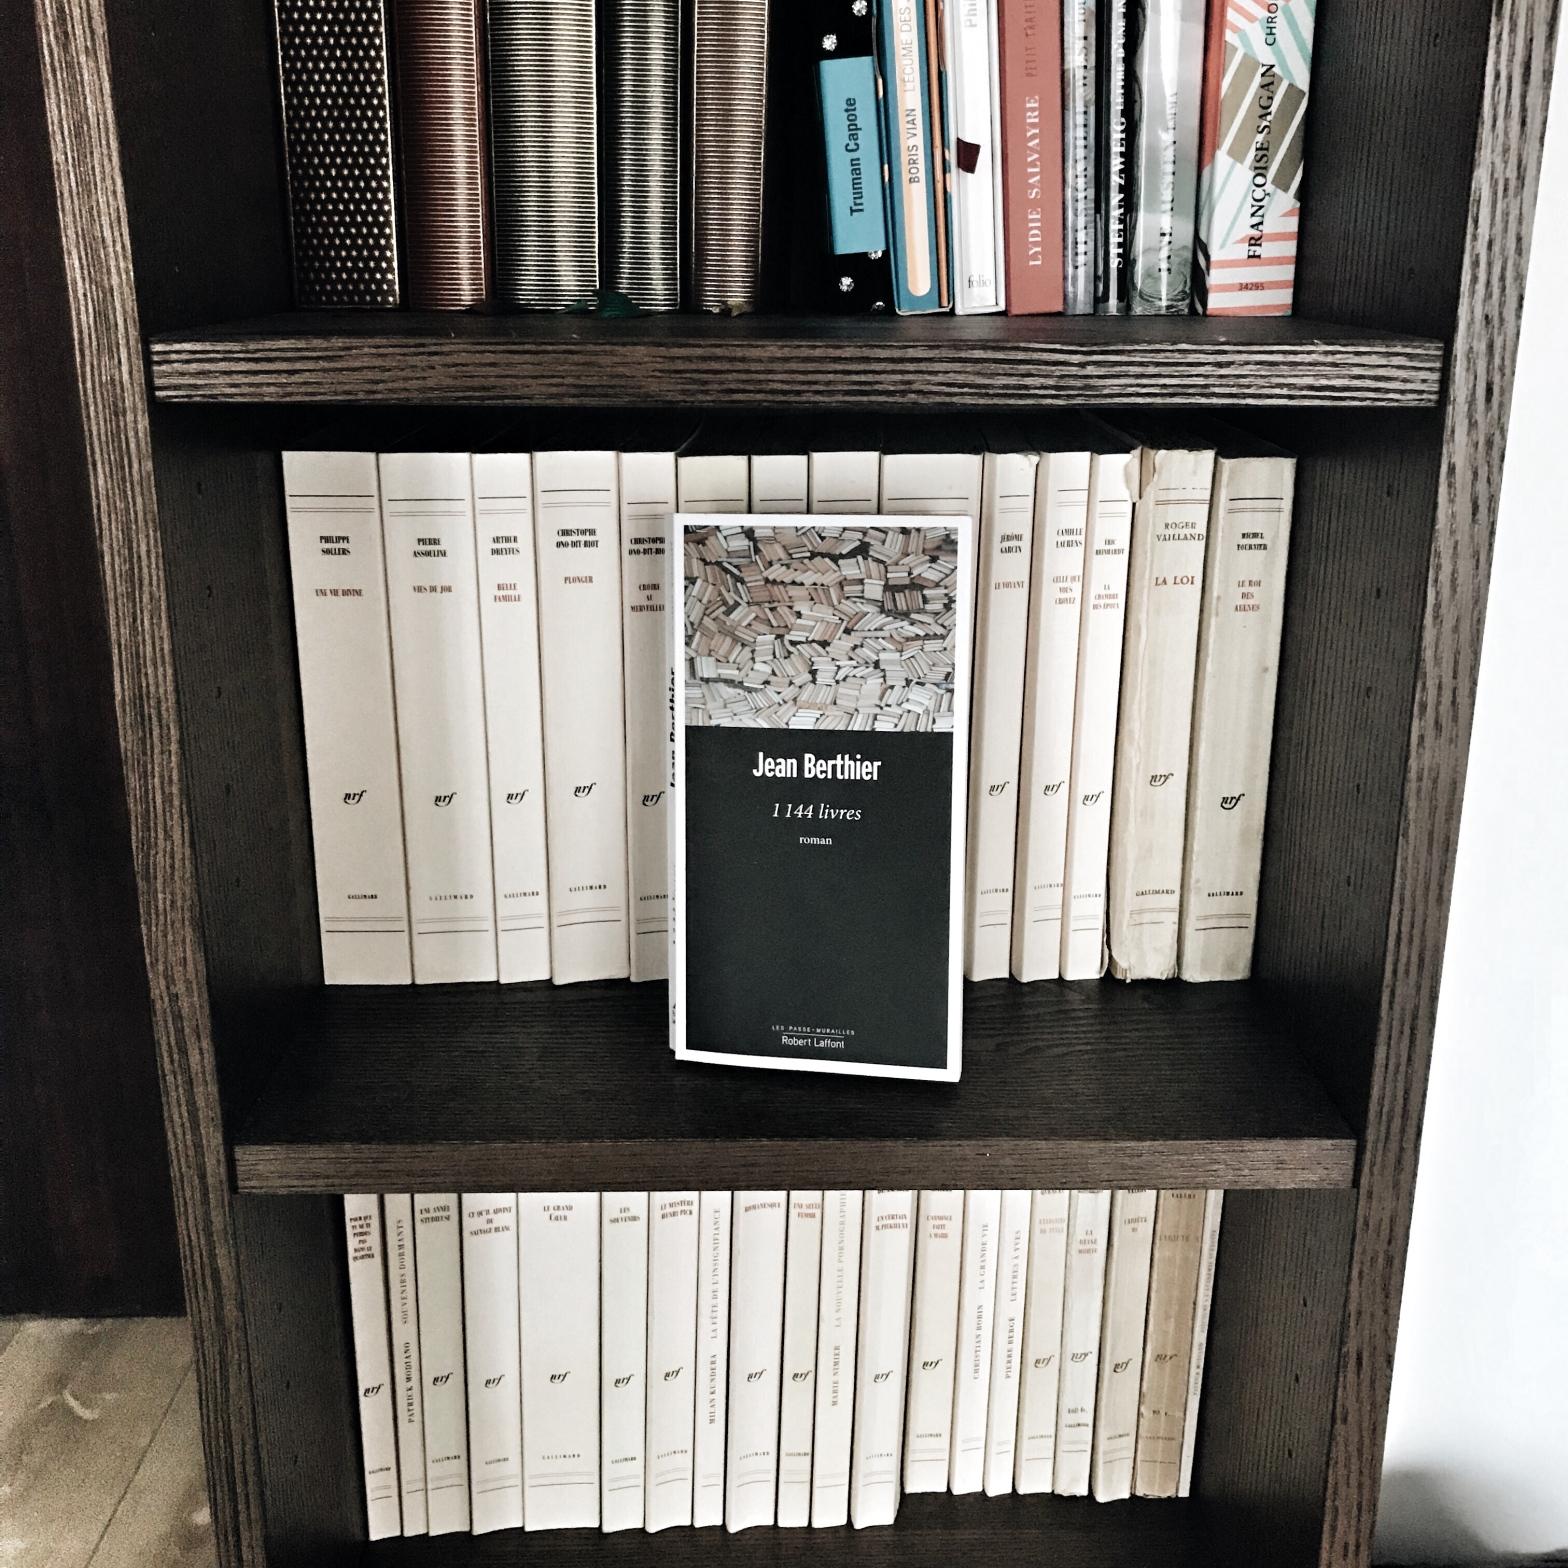 1144 livres, de Jean Berthier